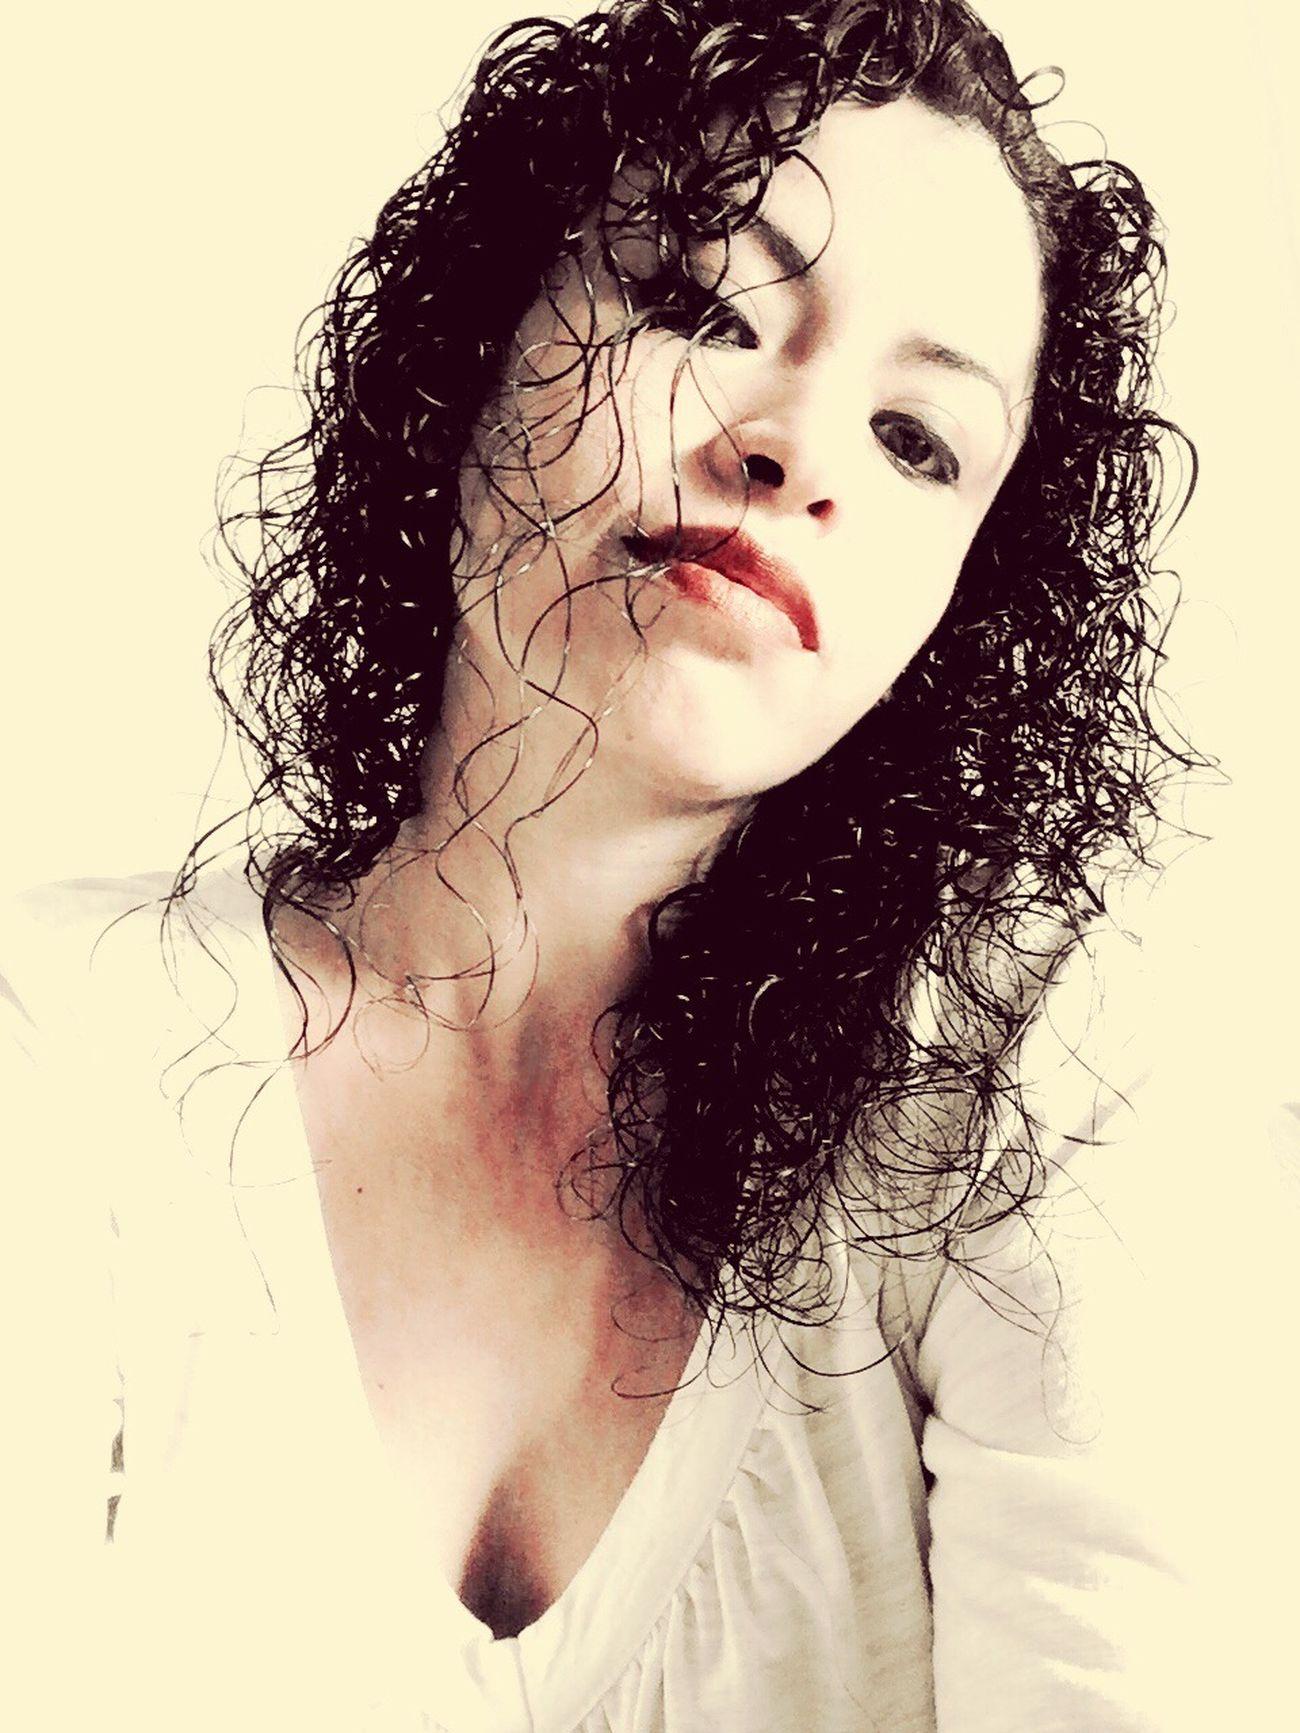 Selfie Pretty Pretty Girl Curls LoveMe Monterrey Love Woow Xoxo Kiss Me MeAmo. <3 Kiss ♥